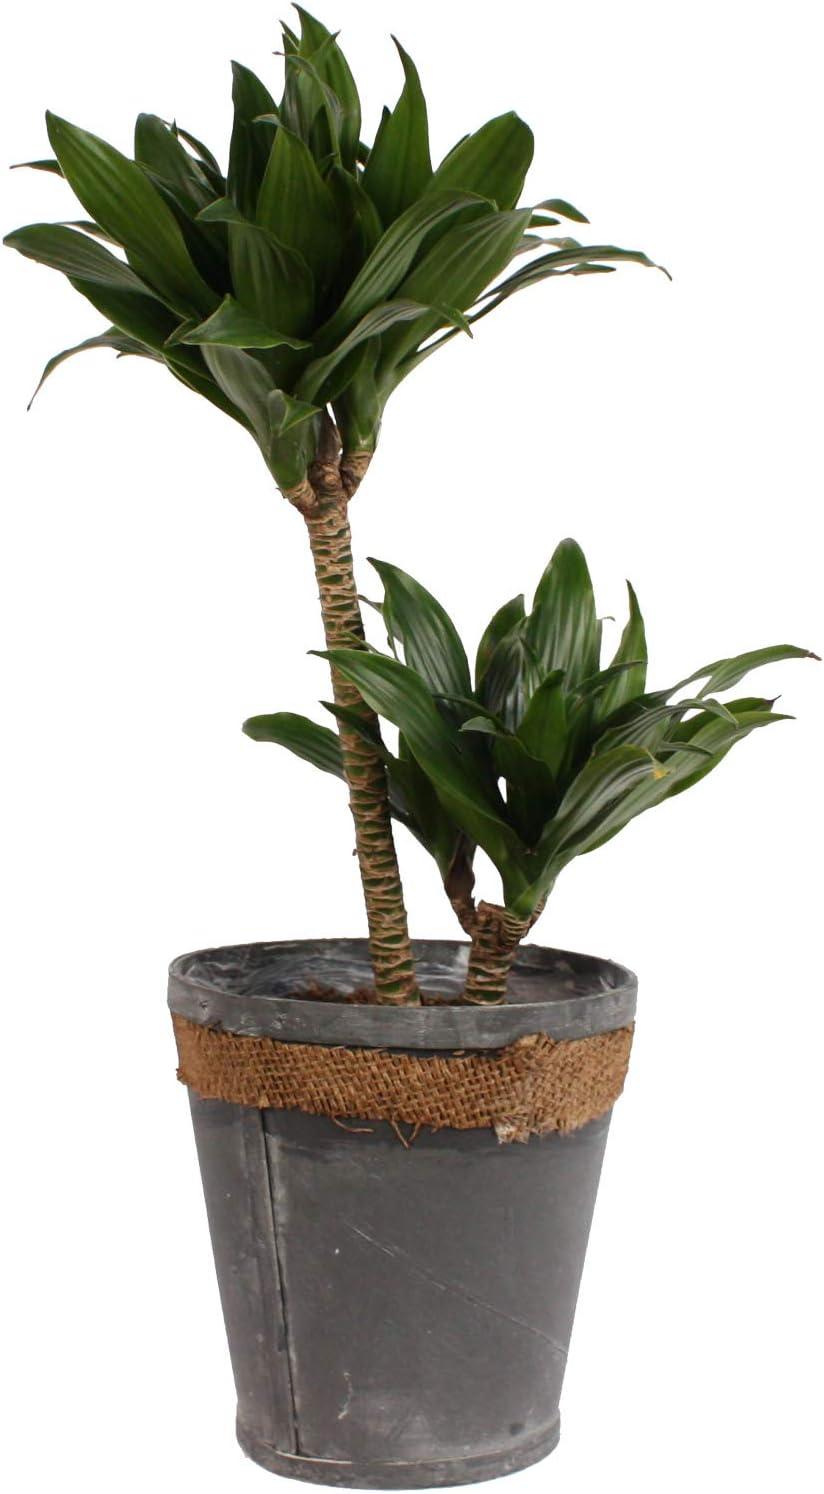 Dracaena compacta two stem house plant in a 17cm pot